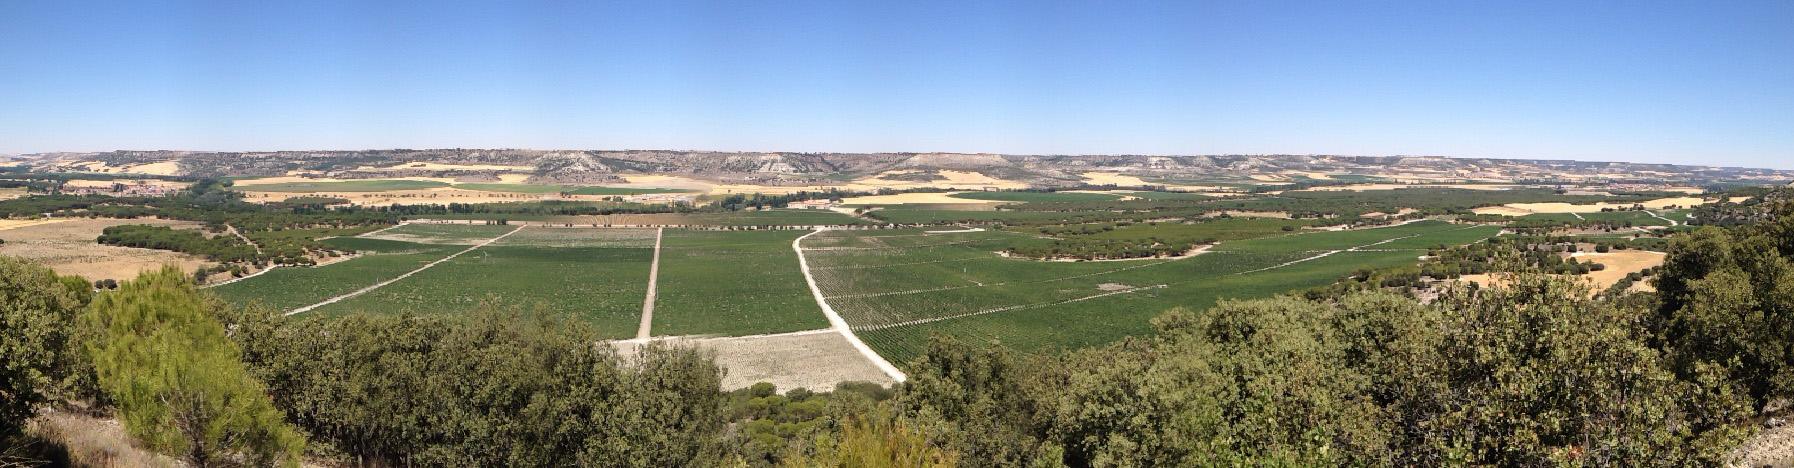 abadia-retuerta-bodega-ribera-del-duero